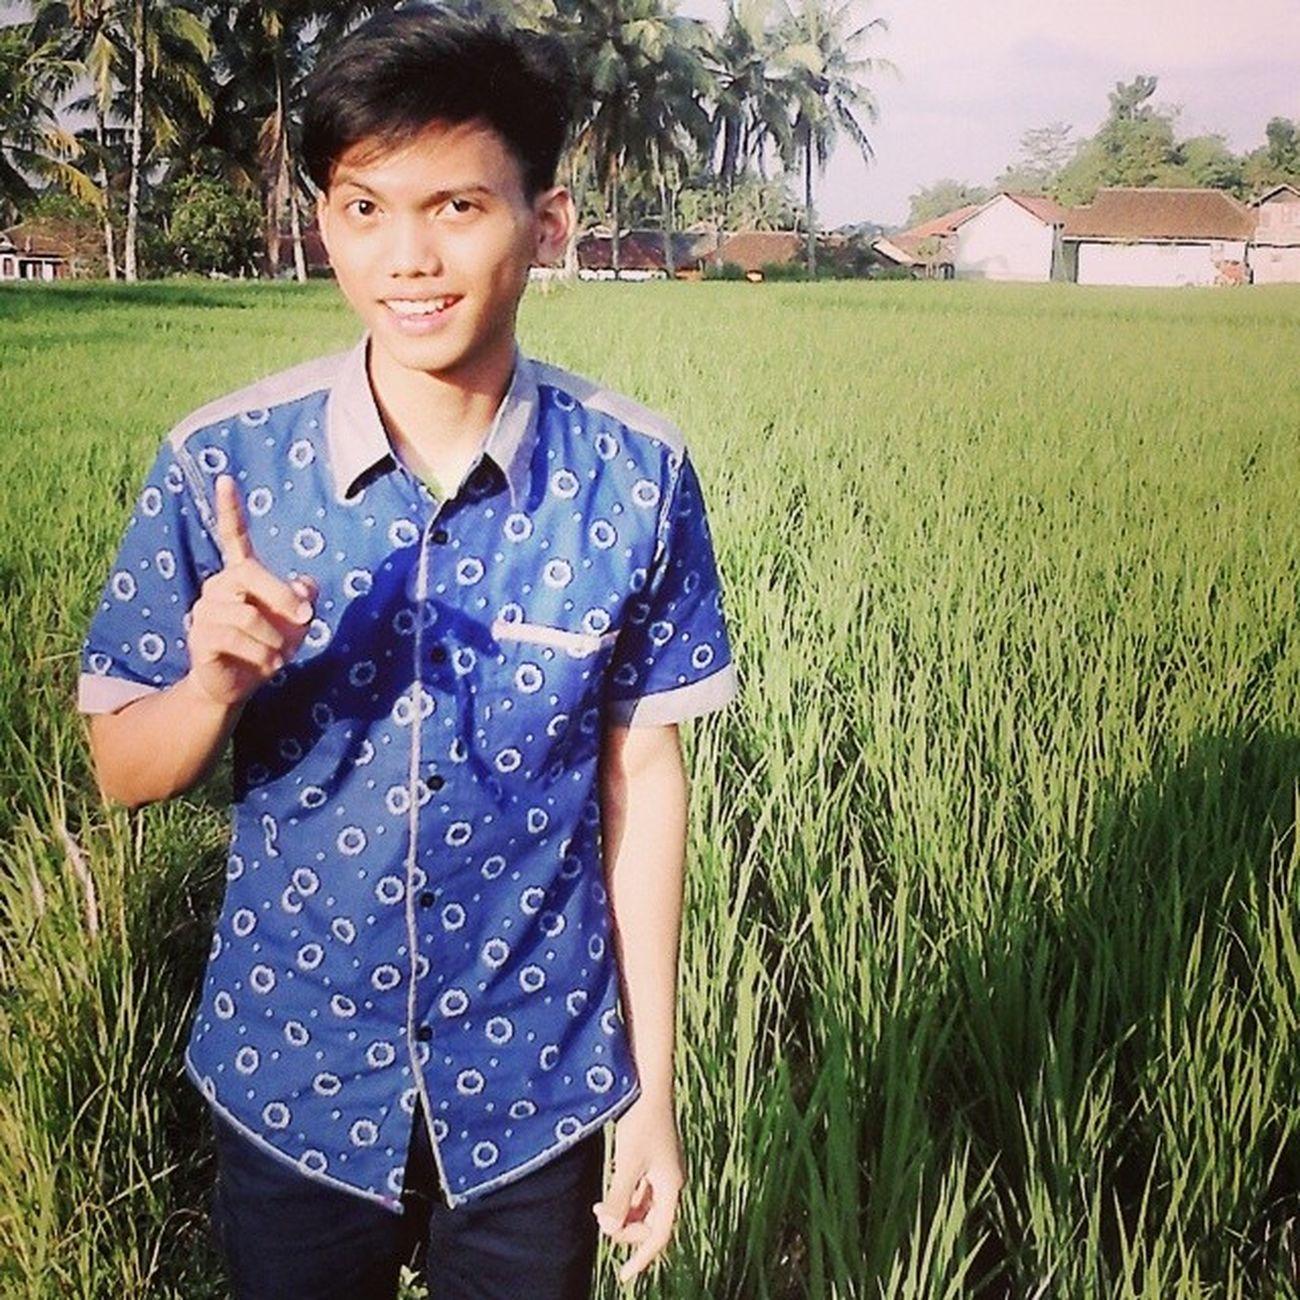 jangan nakal yaa :D NgomongSamaSawah MCR Bfmv A7x NoonShoot UMB Tasikmalaya Tasik Indonesia SelfieDay Selfie SabodoTeuing